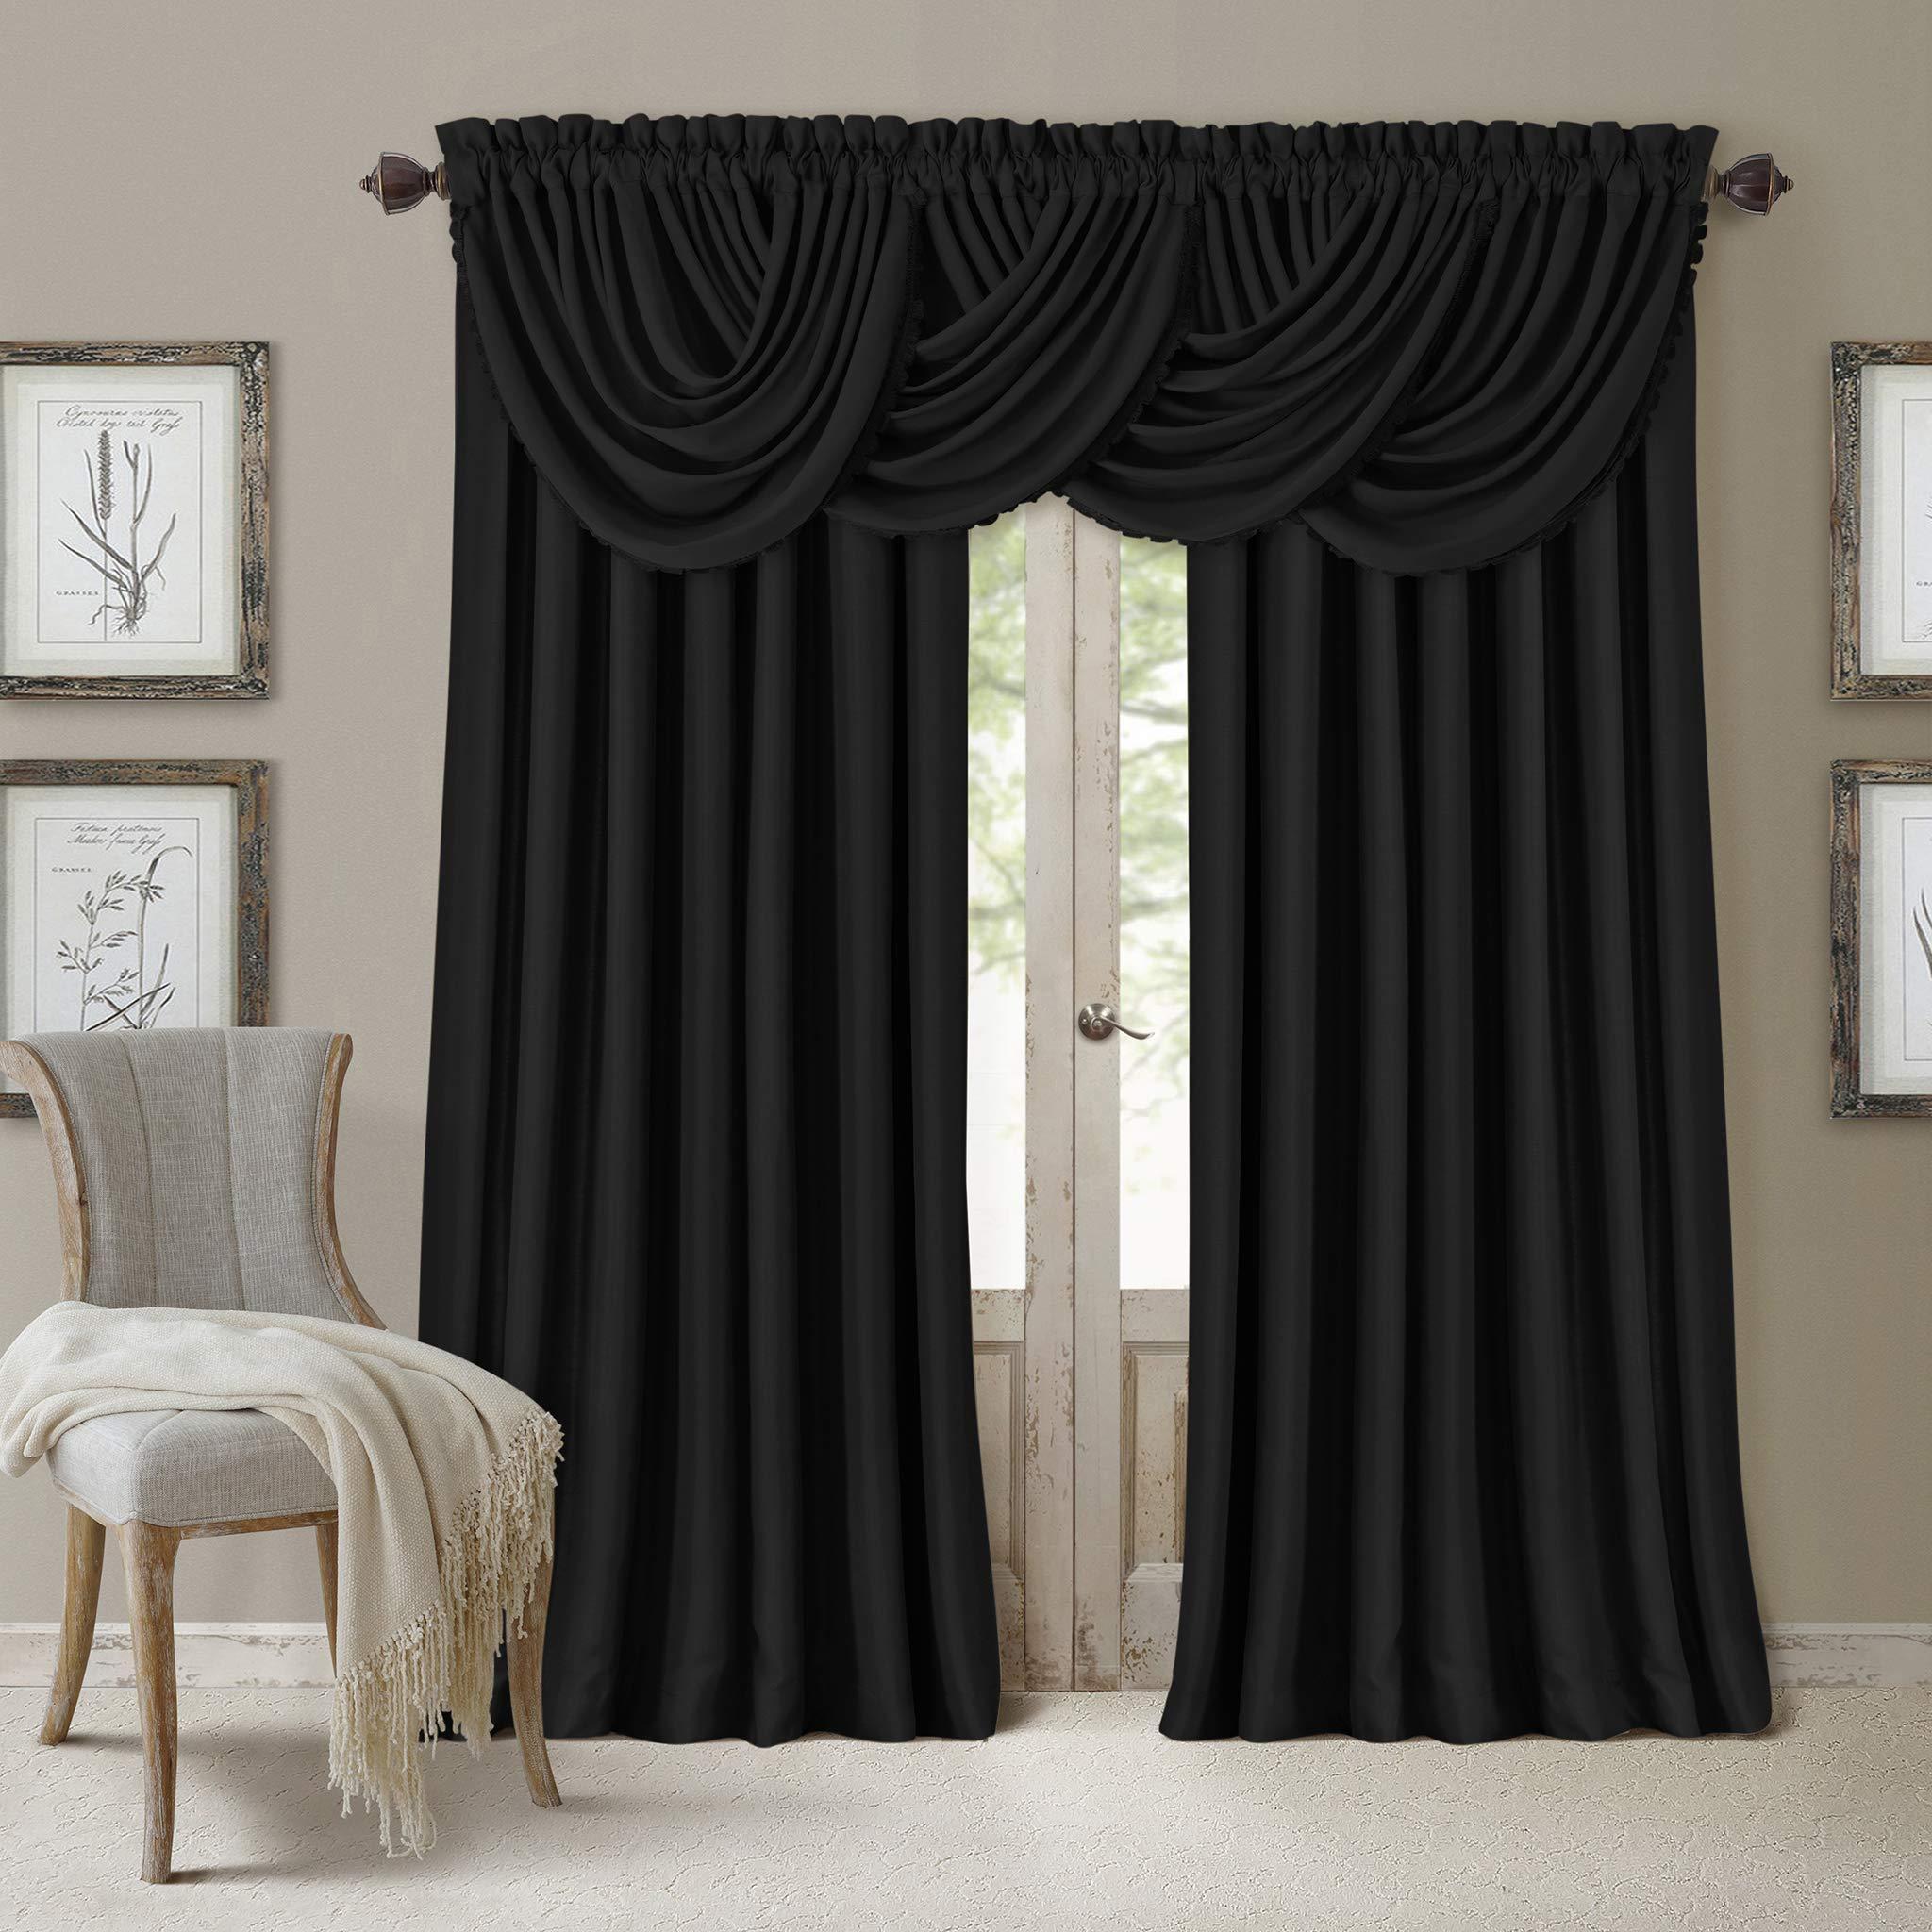 Elrene Home Fashions All Seasons Energy Efficient Room Darkening Rod Pocket Window Panel, 52'' x 84'' (1), Black by Elrene